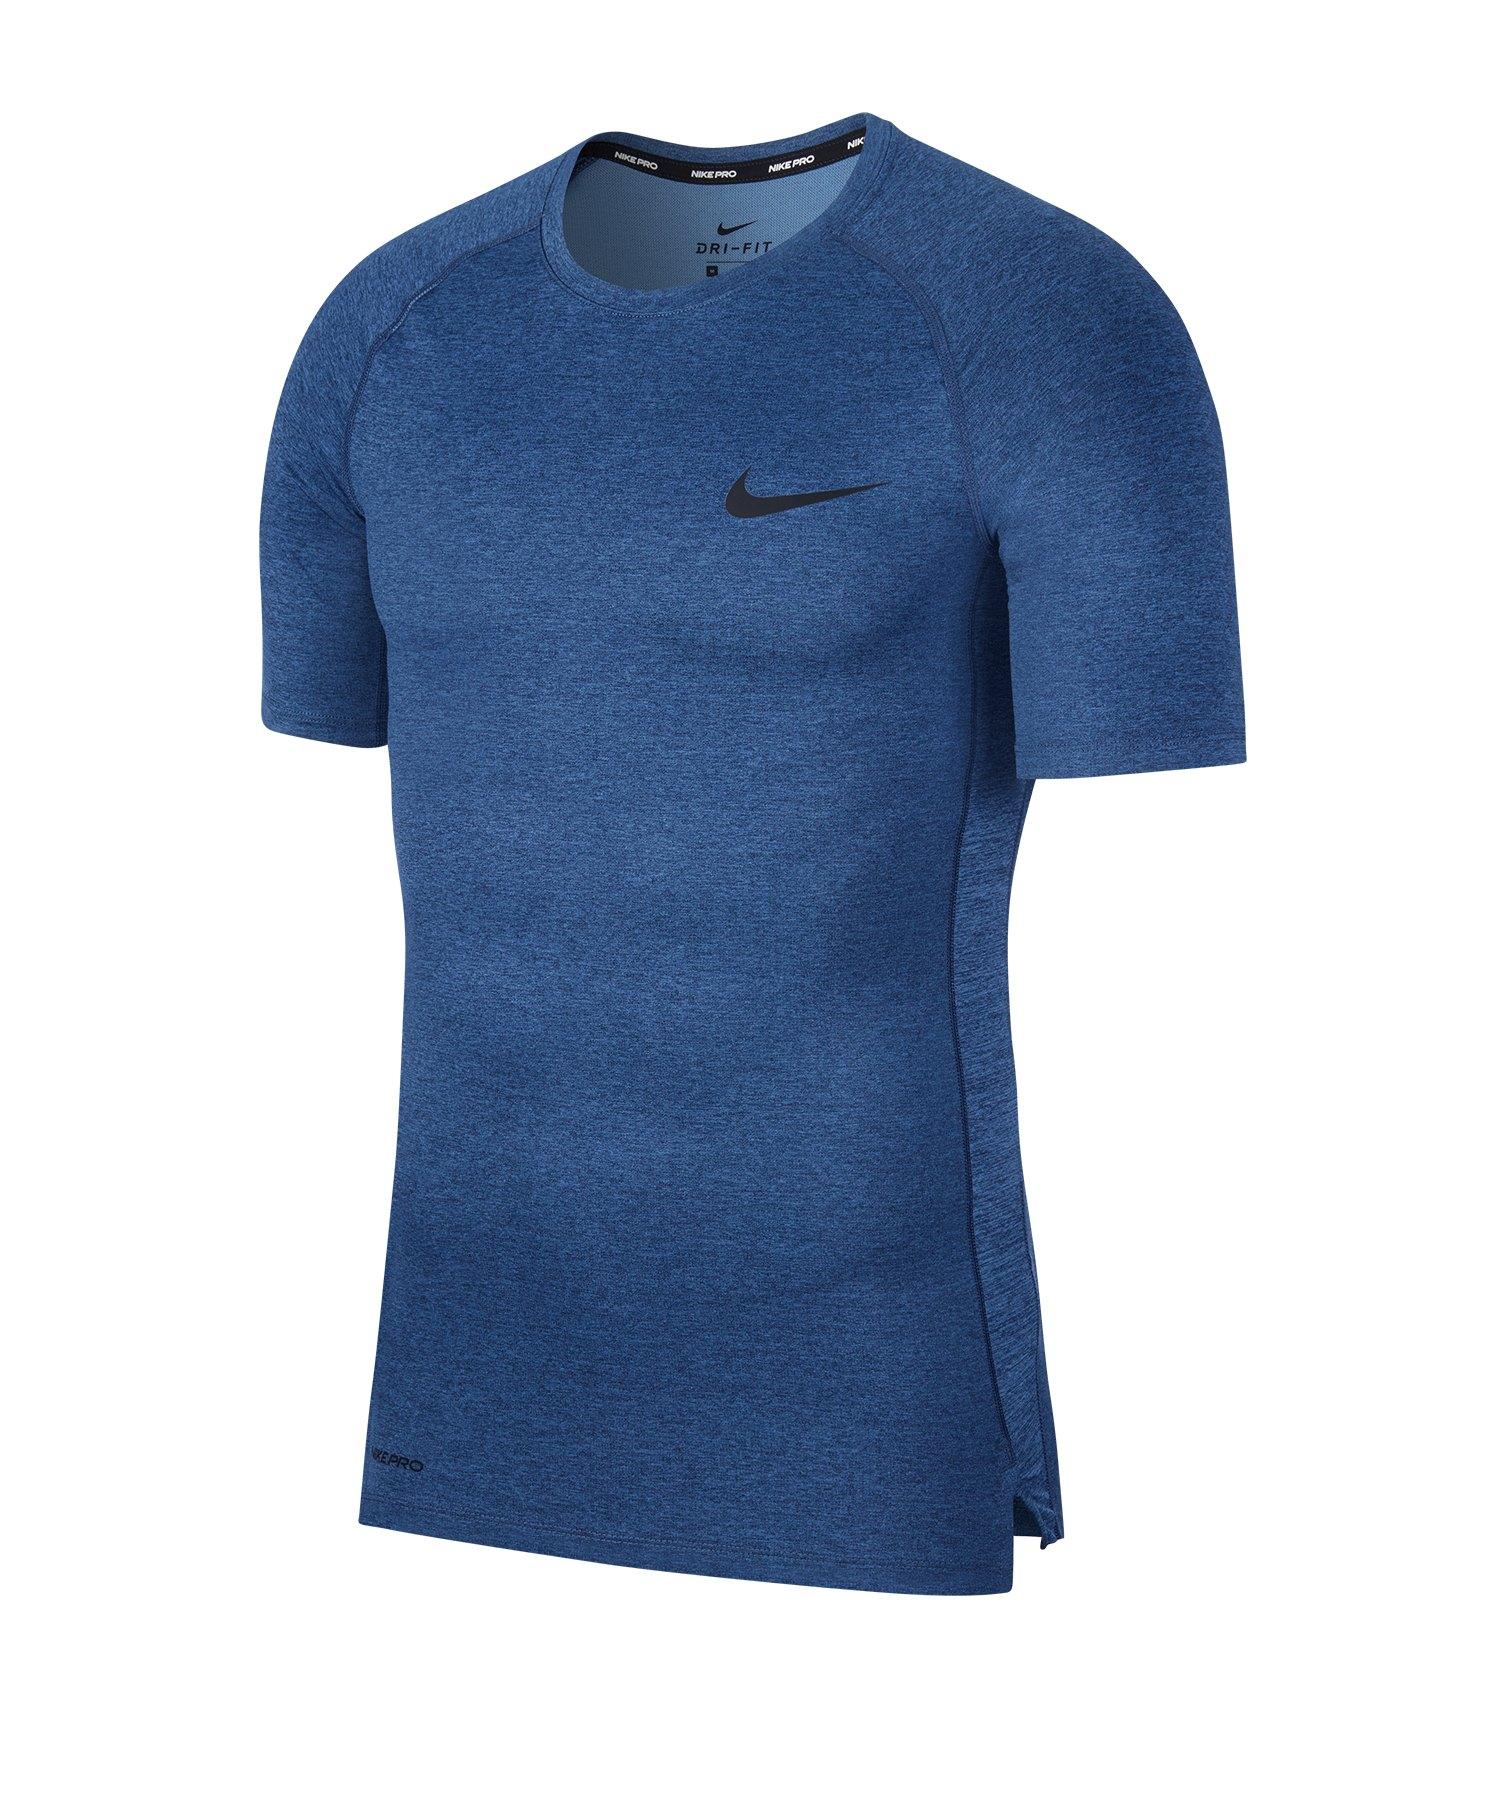 Nike Pro Trainingsshirt kurzarm Blau F451 - blau